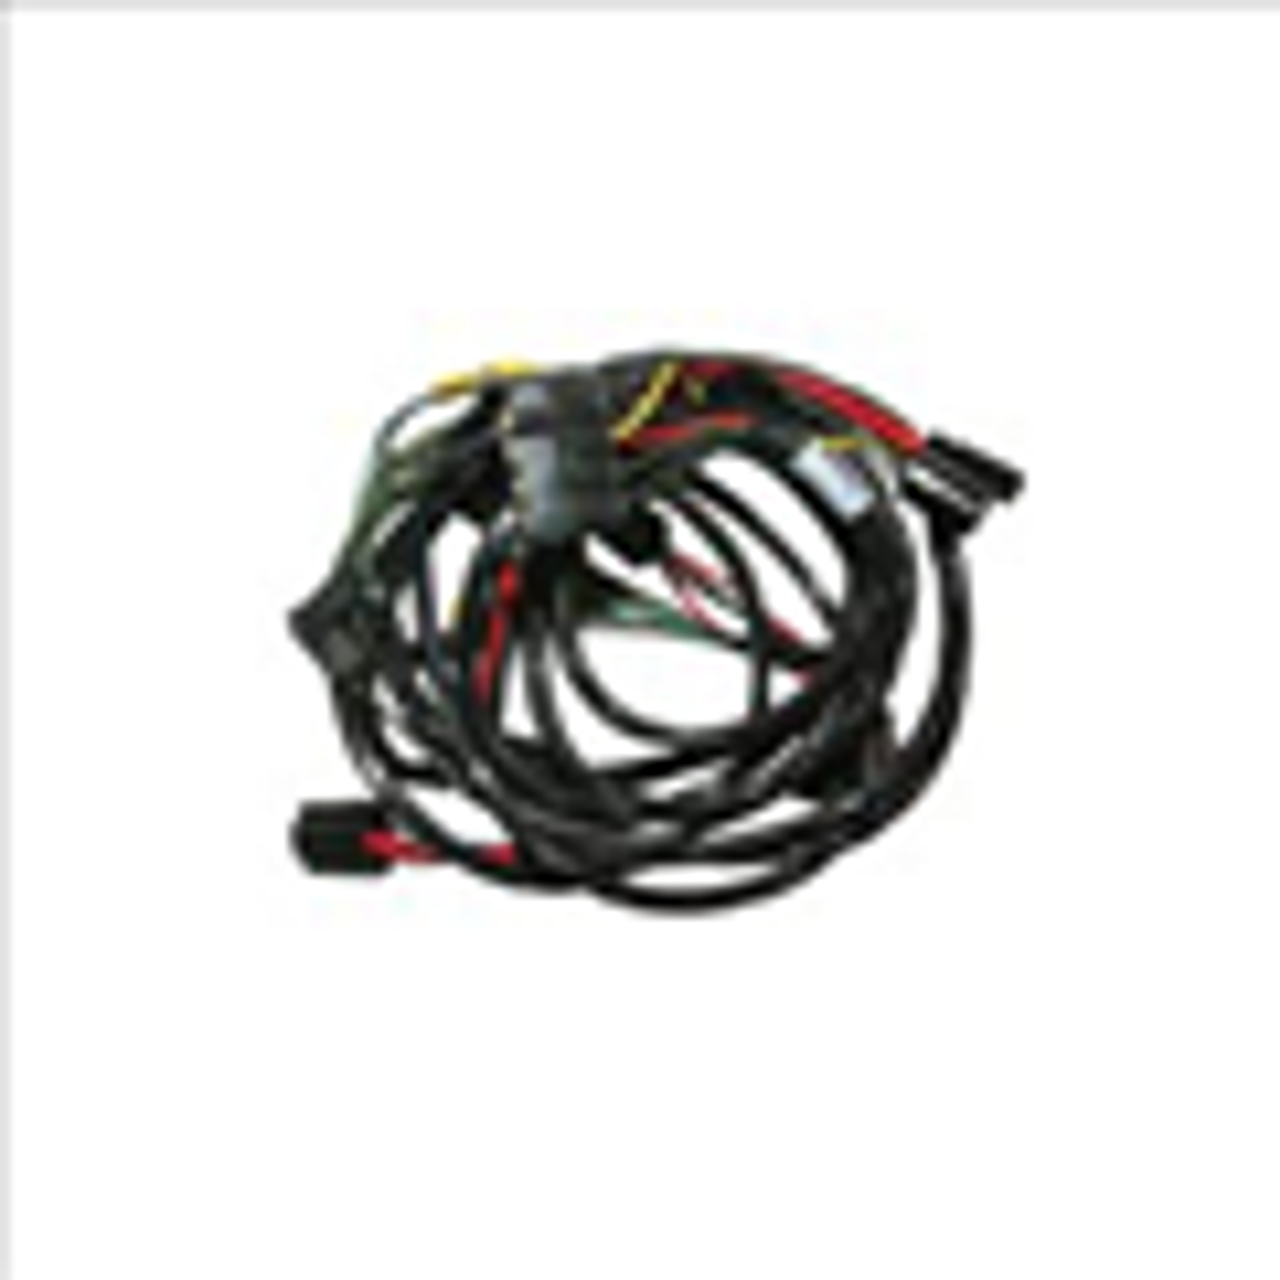 1974 dodge challenger wiring harness hu323e  74  1974  wiring harness  engine harness  e body cuda  wiring harness  engine harness  e body